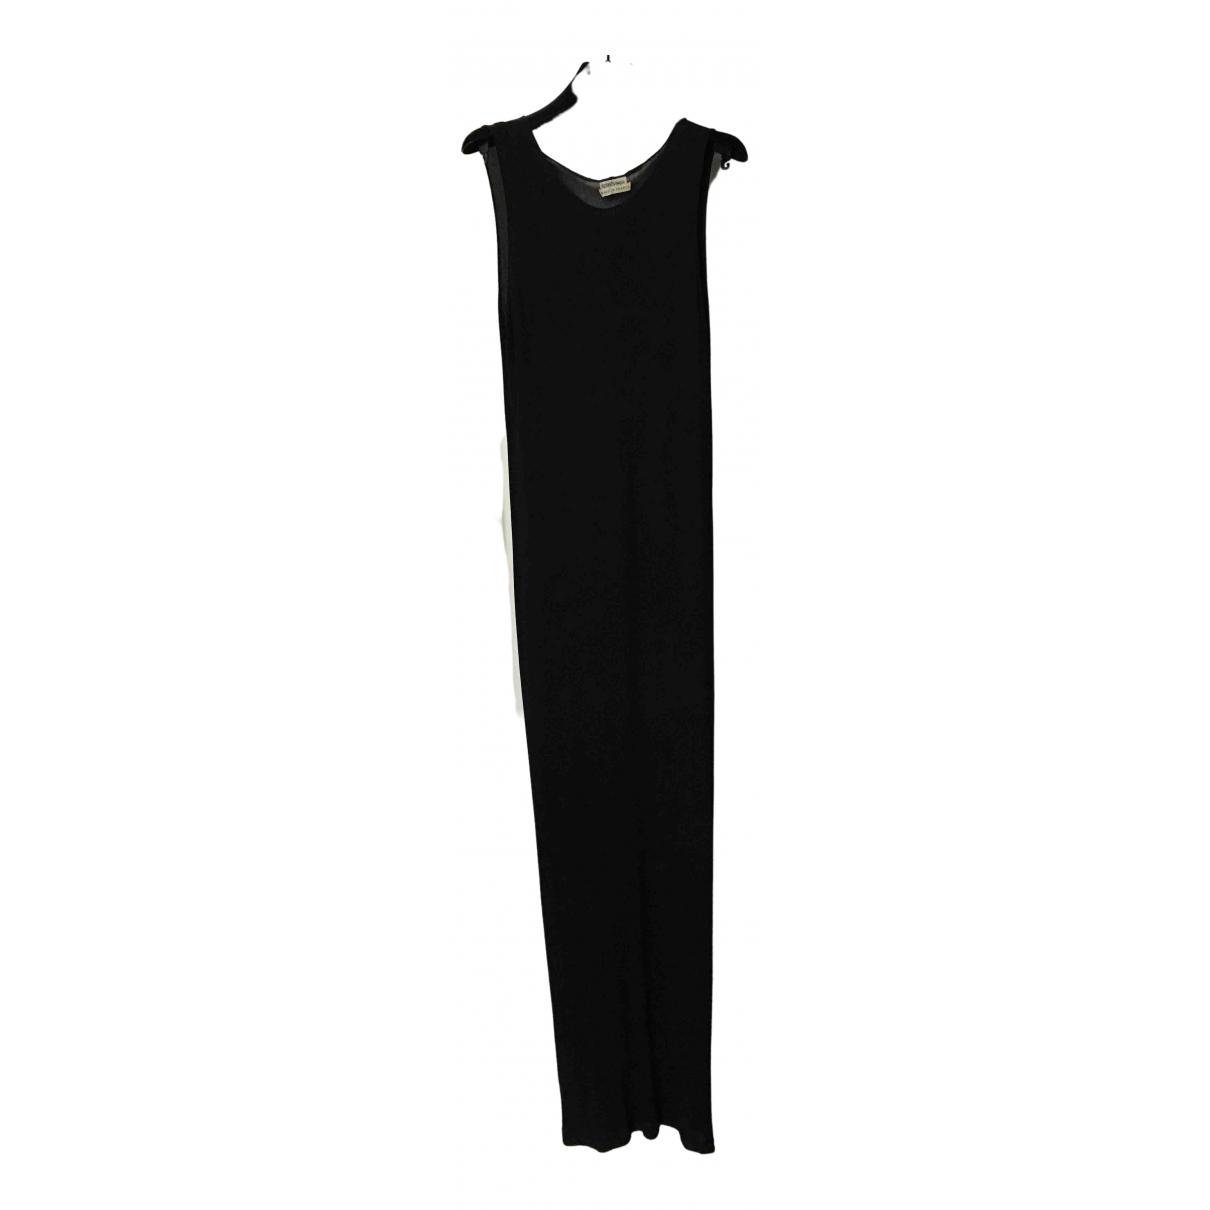 Hermès \N Black Silk dress for Women 40 FR